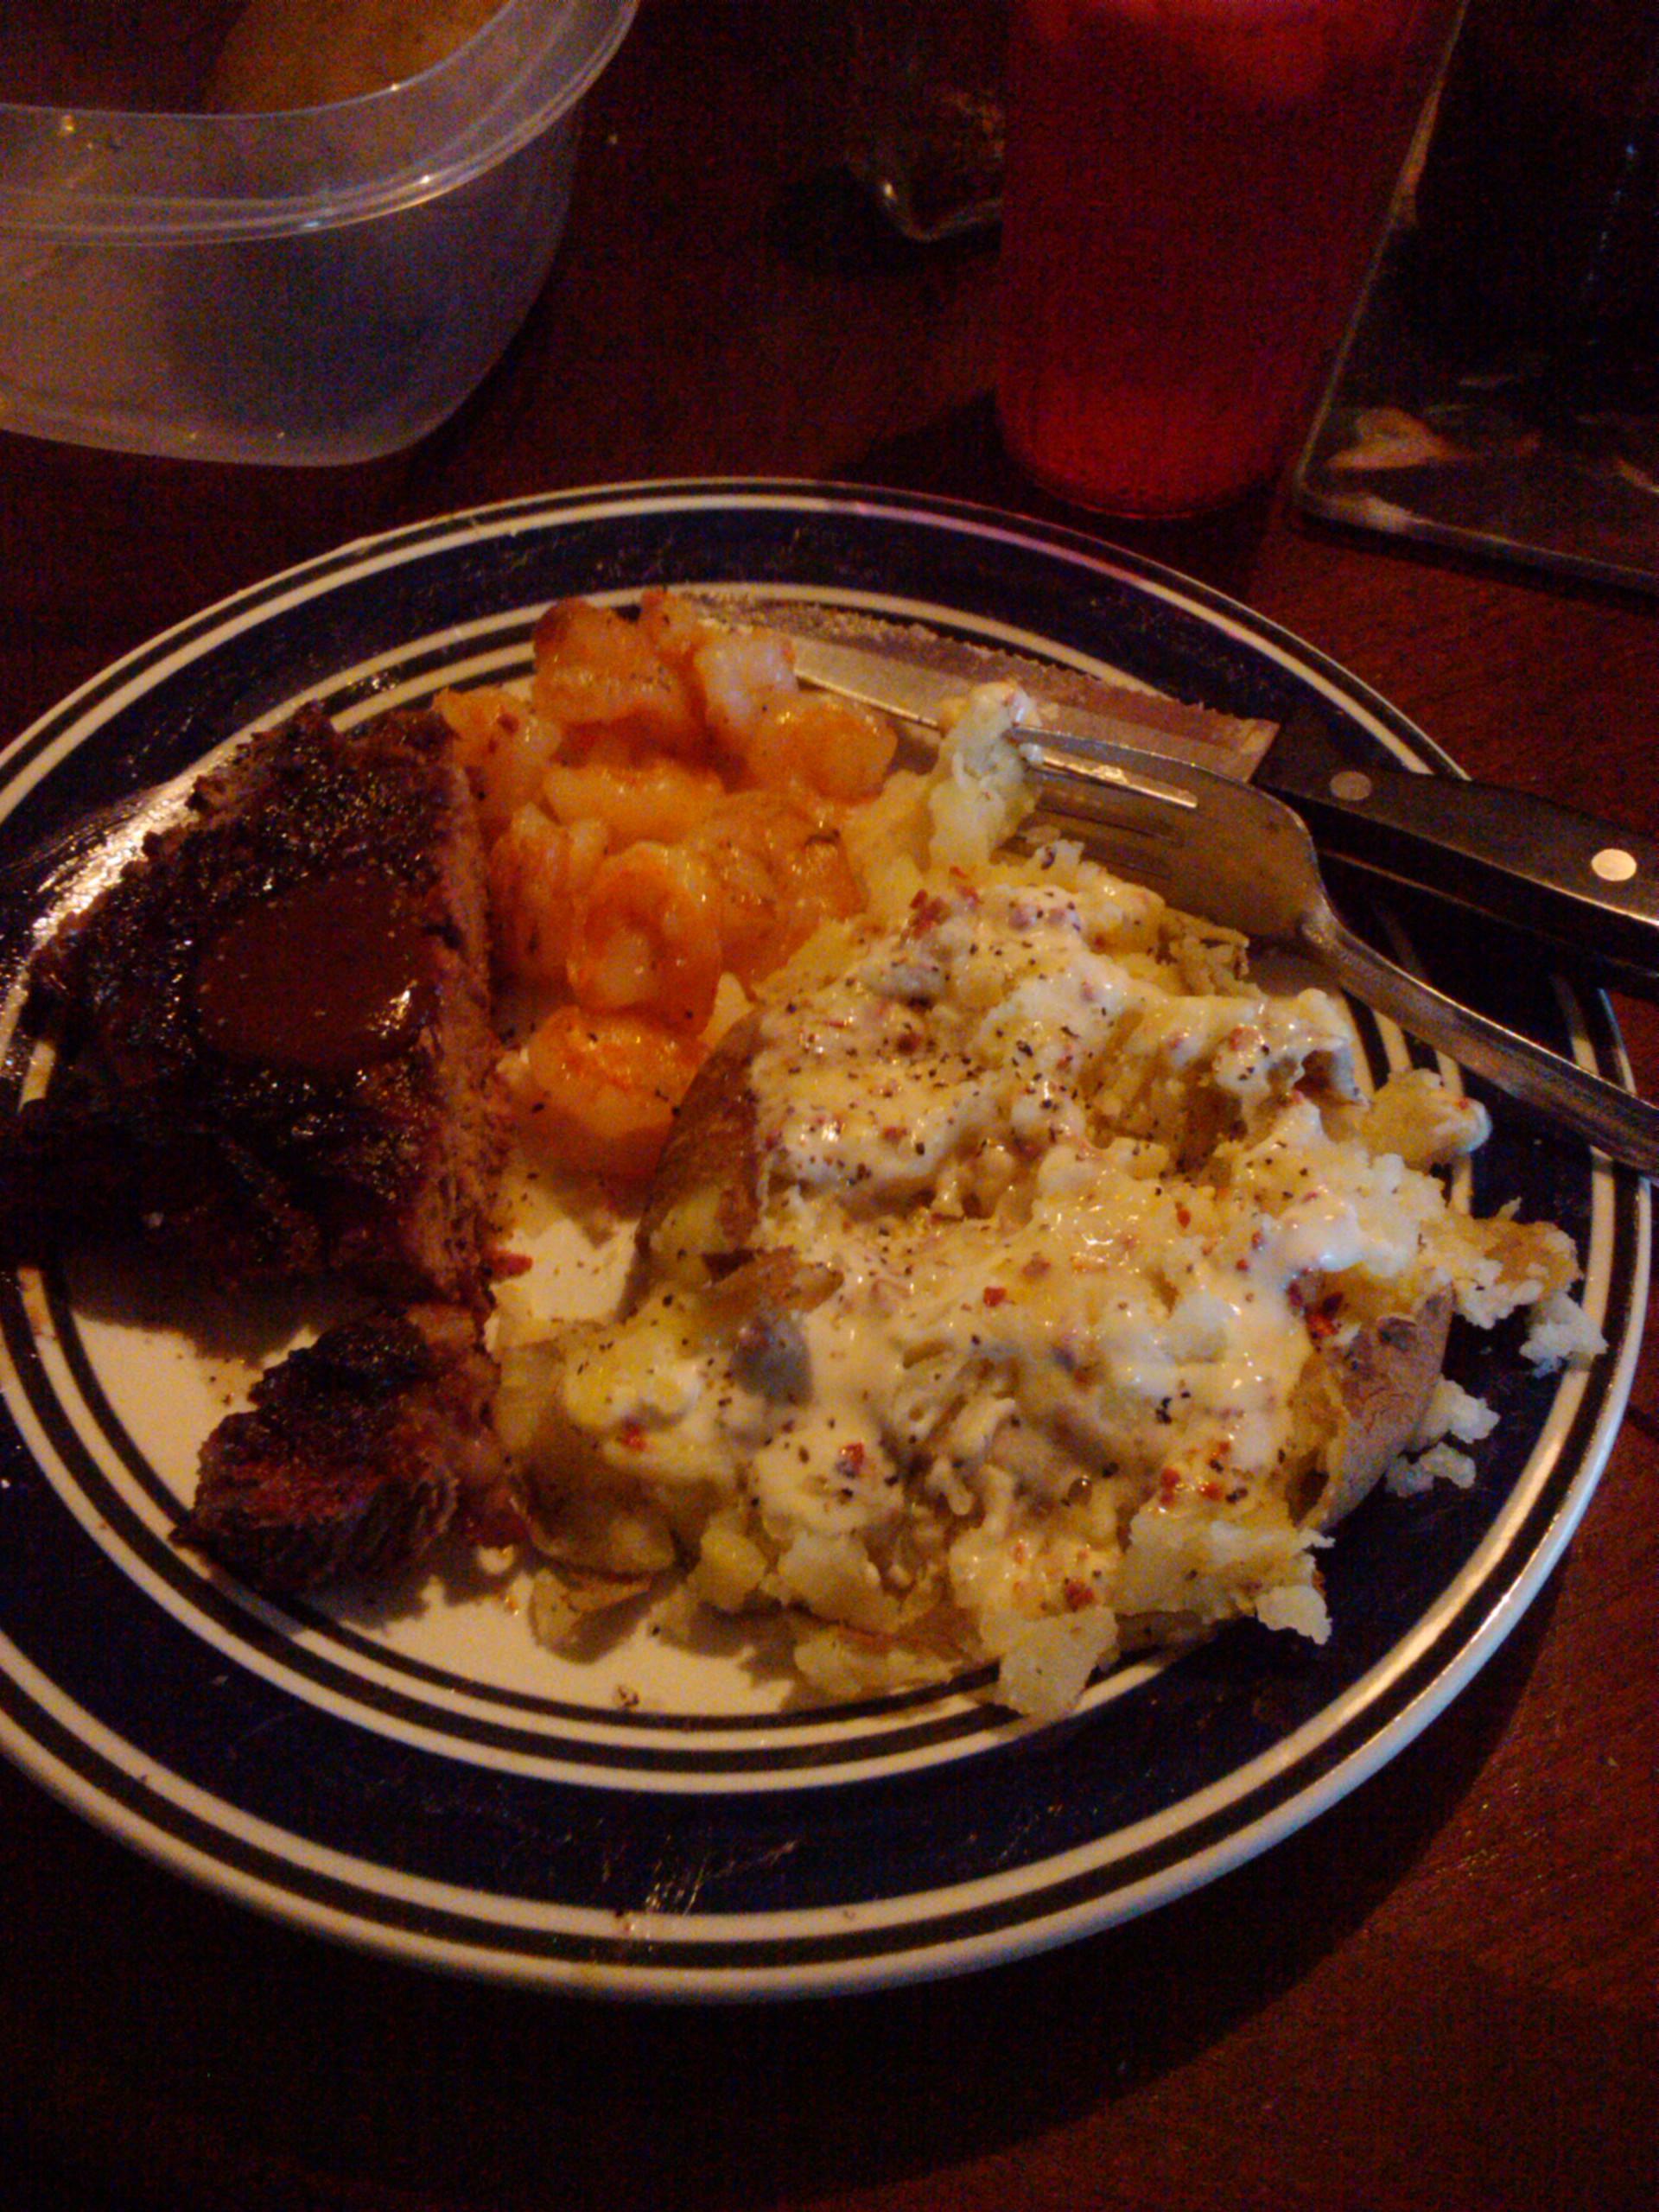 houston tx in laporte tx at my gurlfriend house :: steak shrimp nd pototas